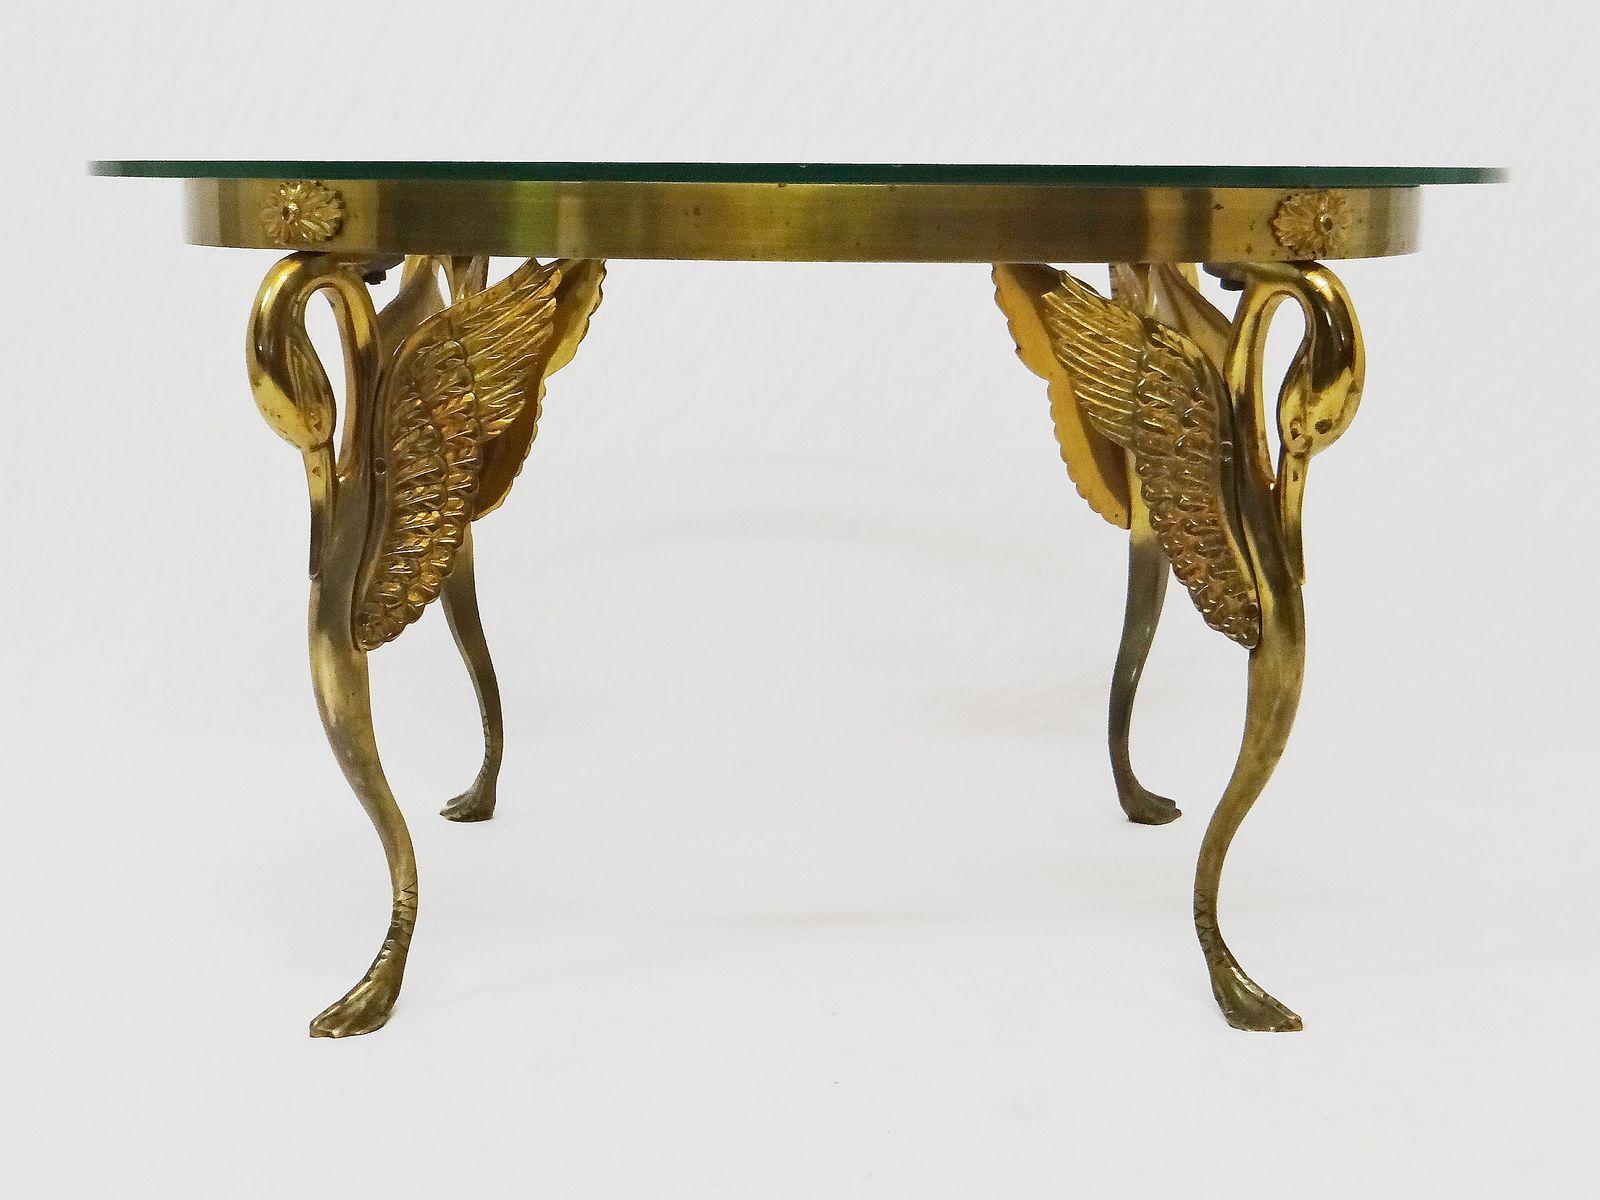 Vintage Art Deco Bronze Swan Coffee Table 9. $2,425.00. Price Per Piece